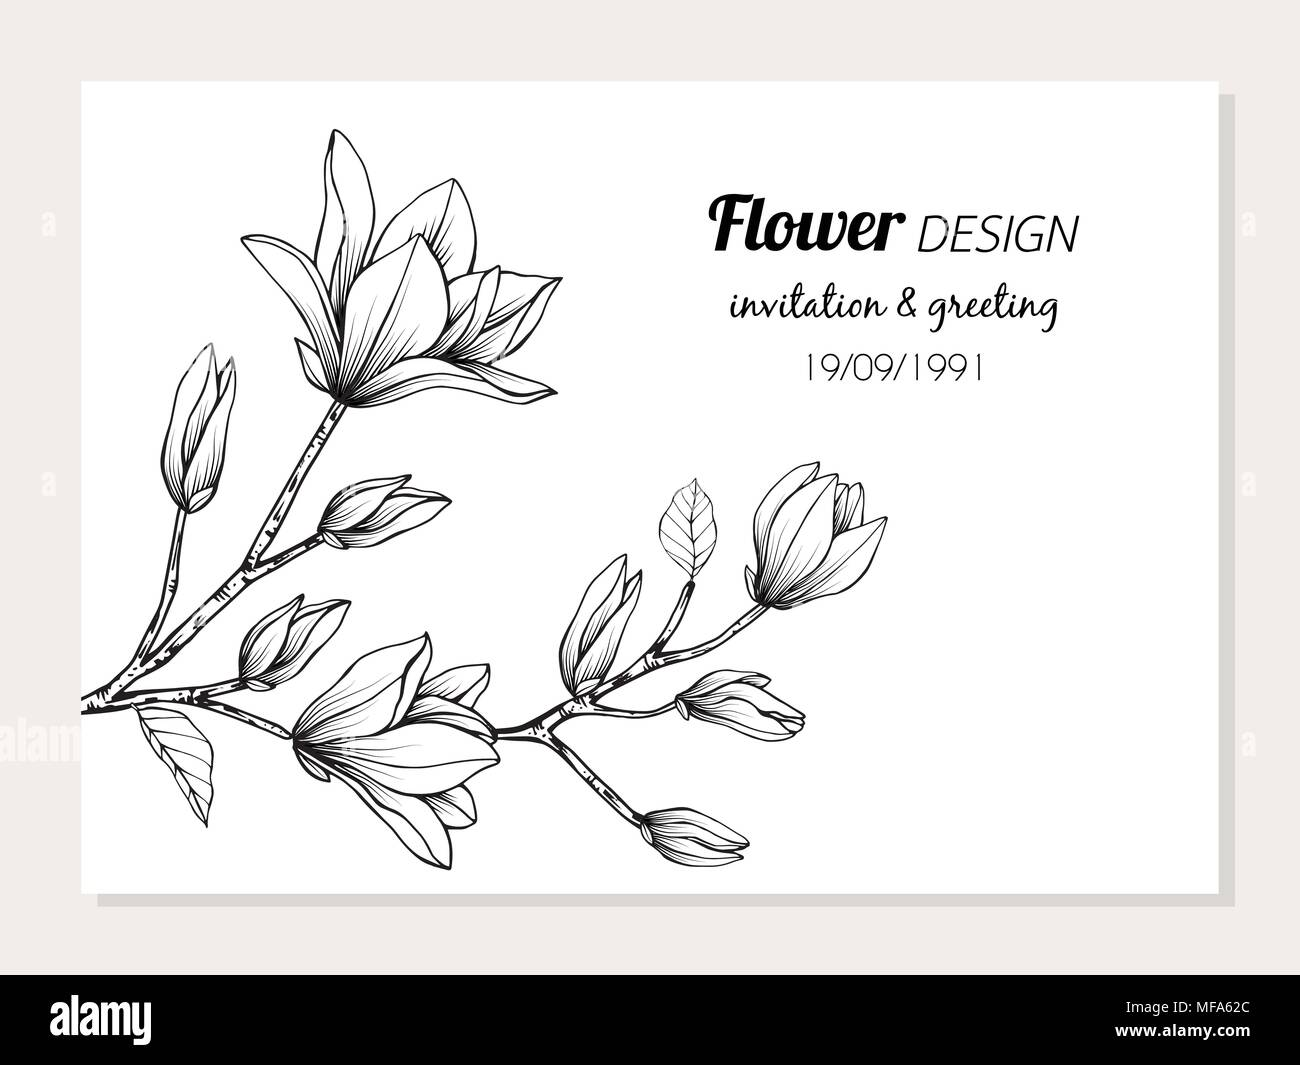 Magnolia Flower Frame Drawing Illustration For Invitation And